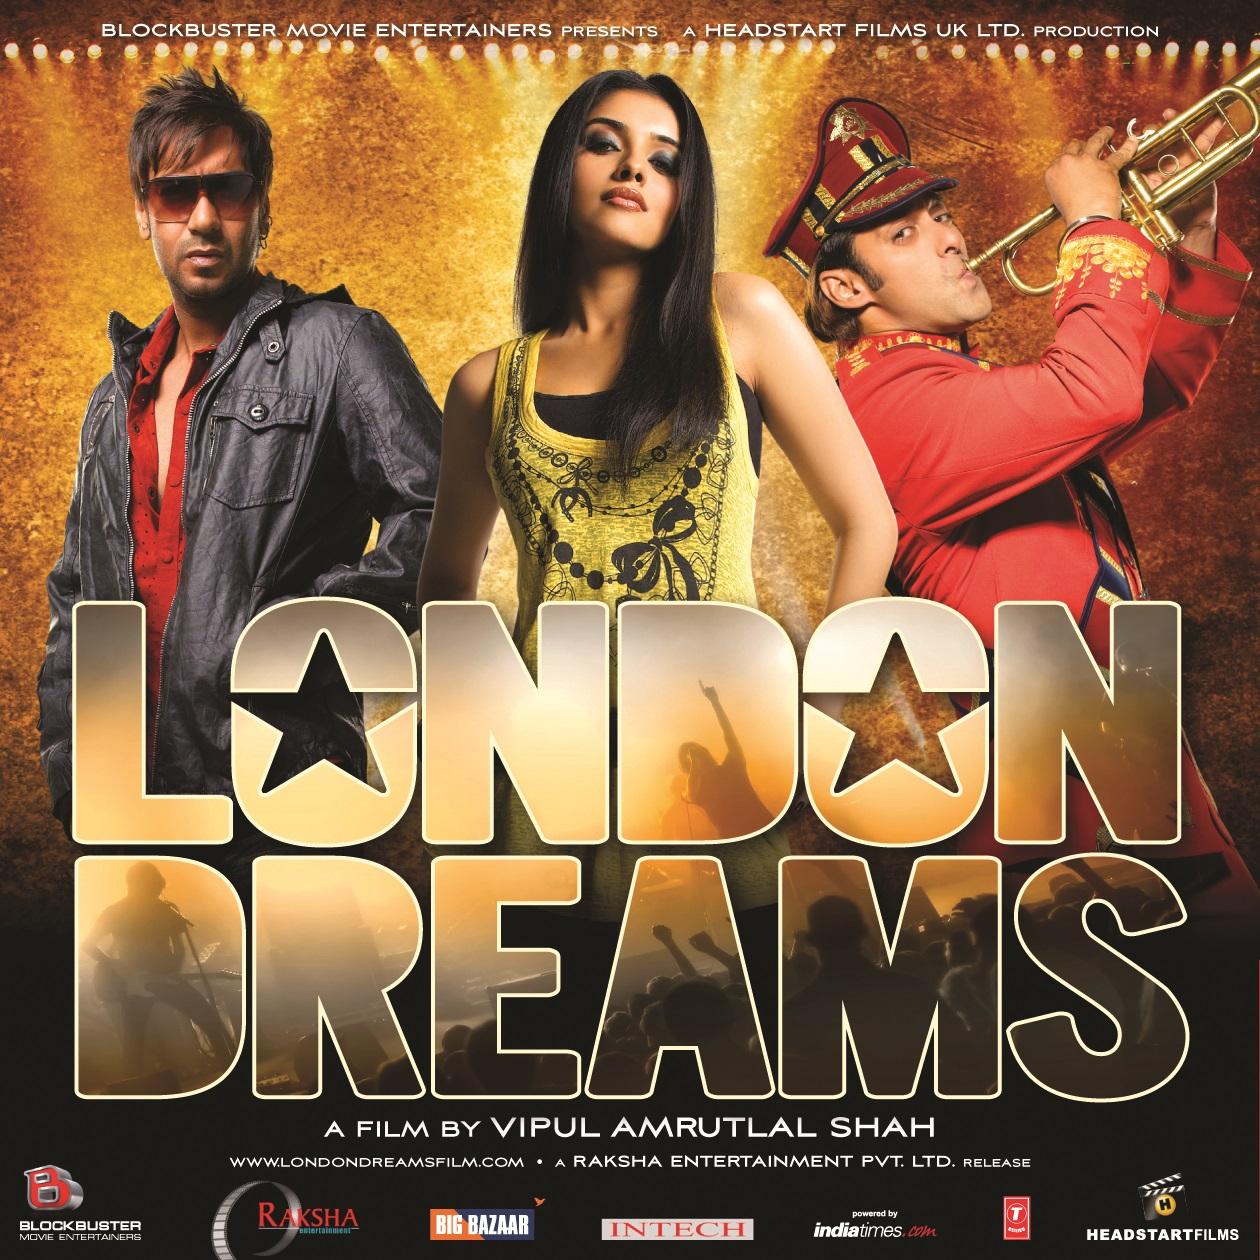 London Dreams Movie Poster - Ajay Devgan, Salman Khan And Asin - Full HD Desktop Wallpaper